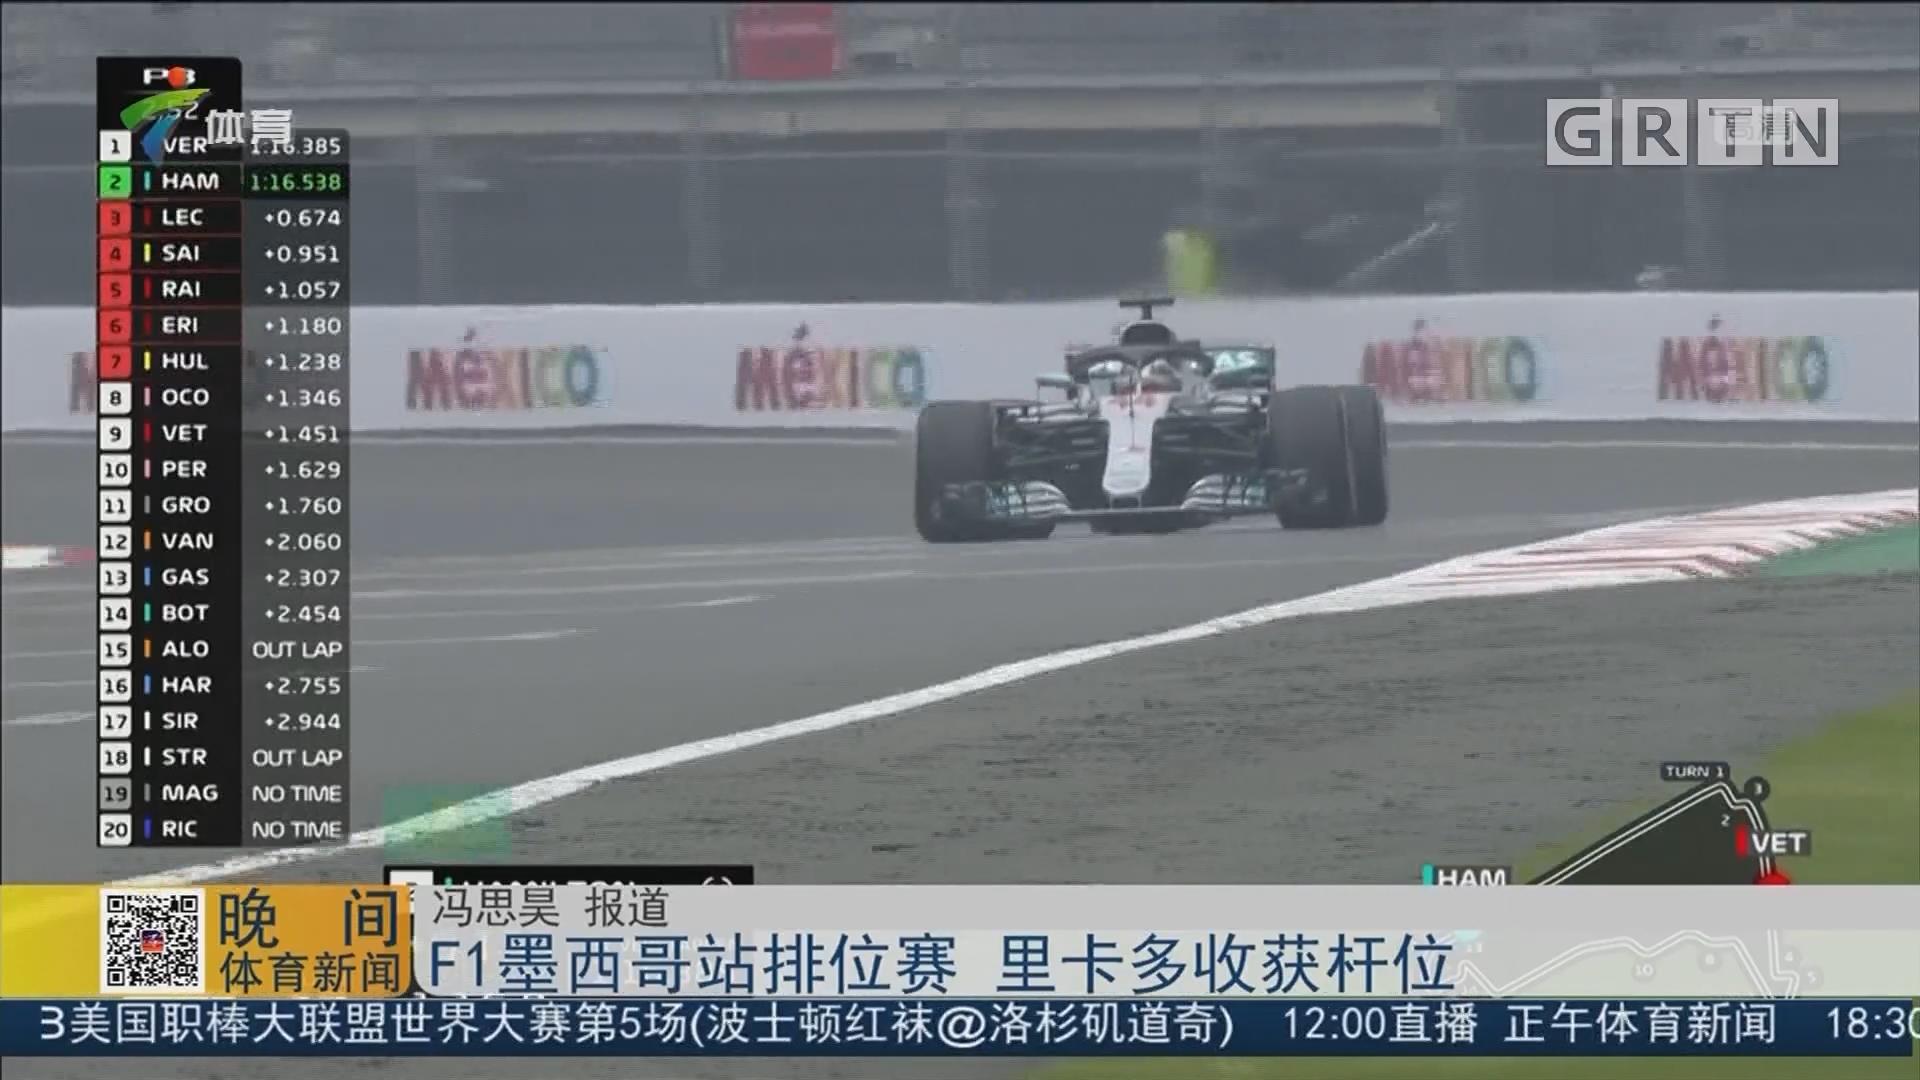 F1墨西哥站排位赛 里卡多收获杆位